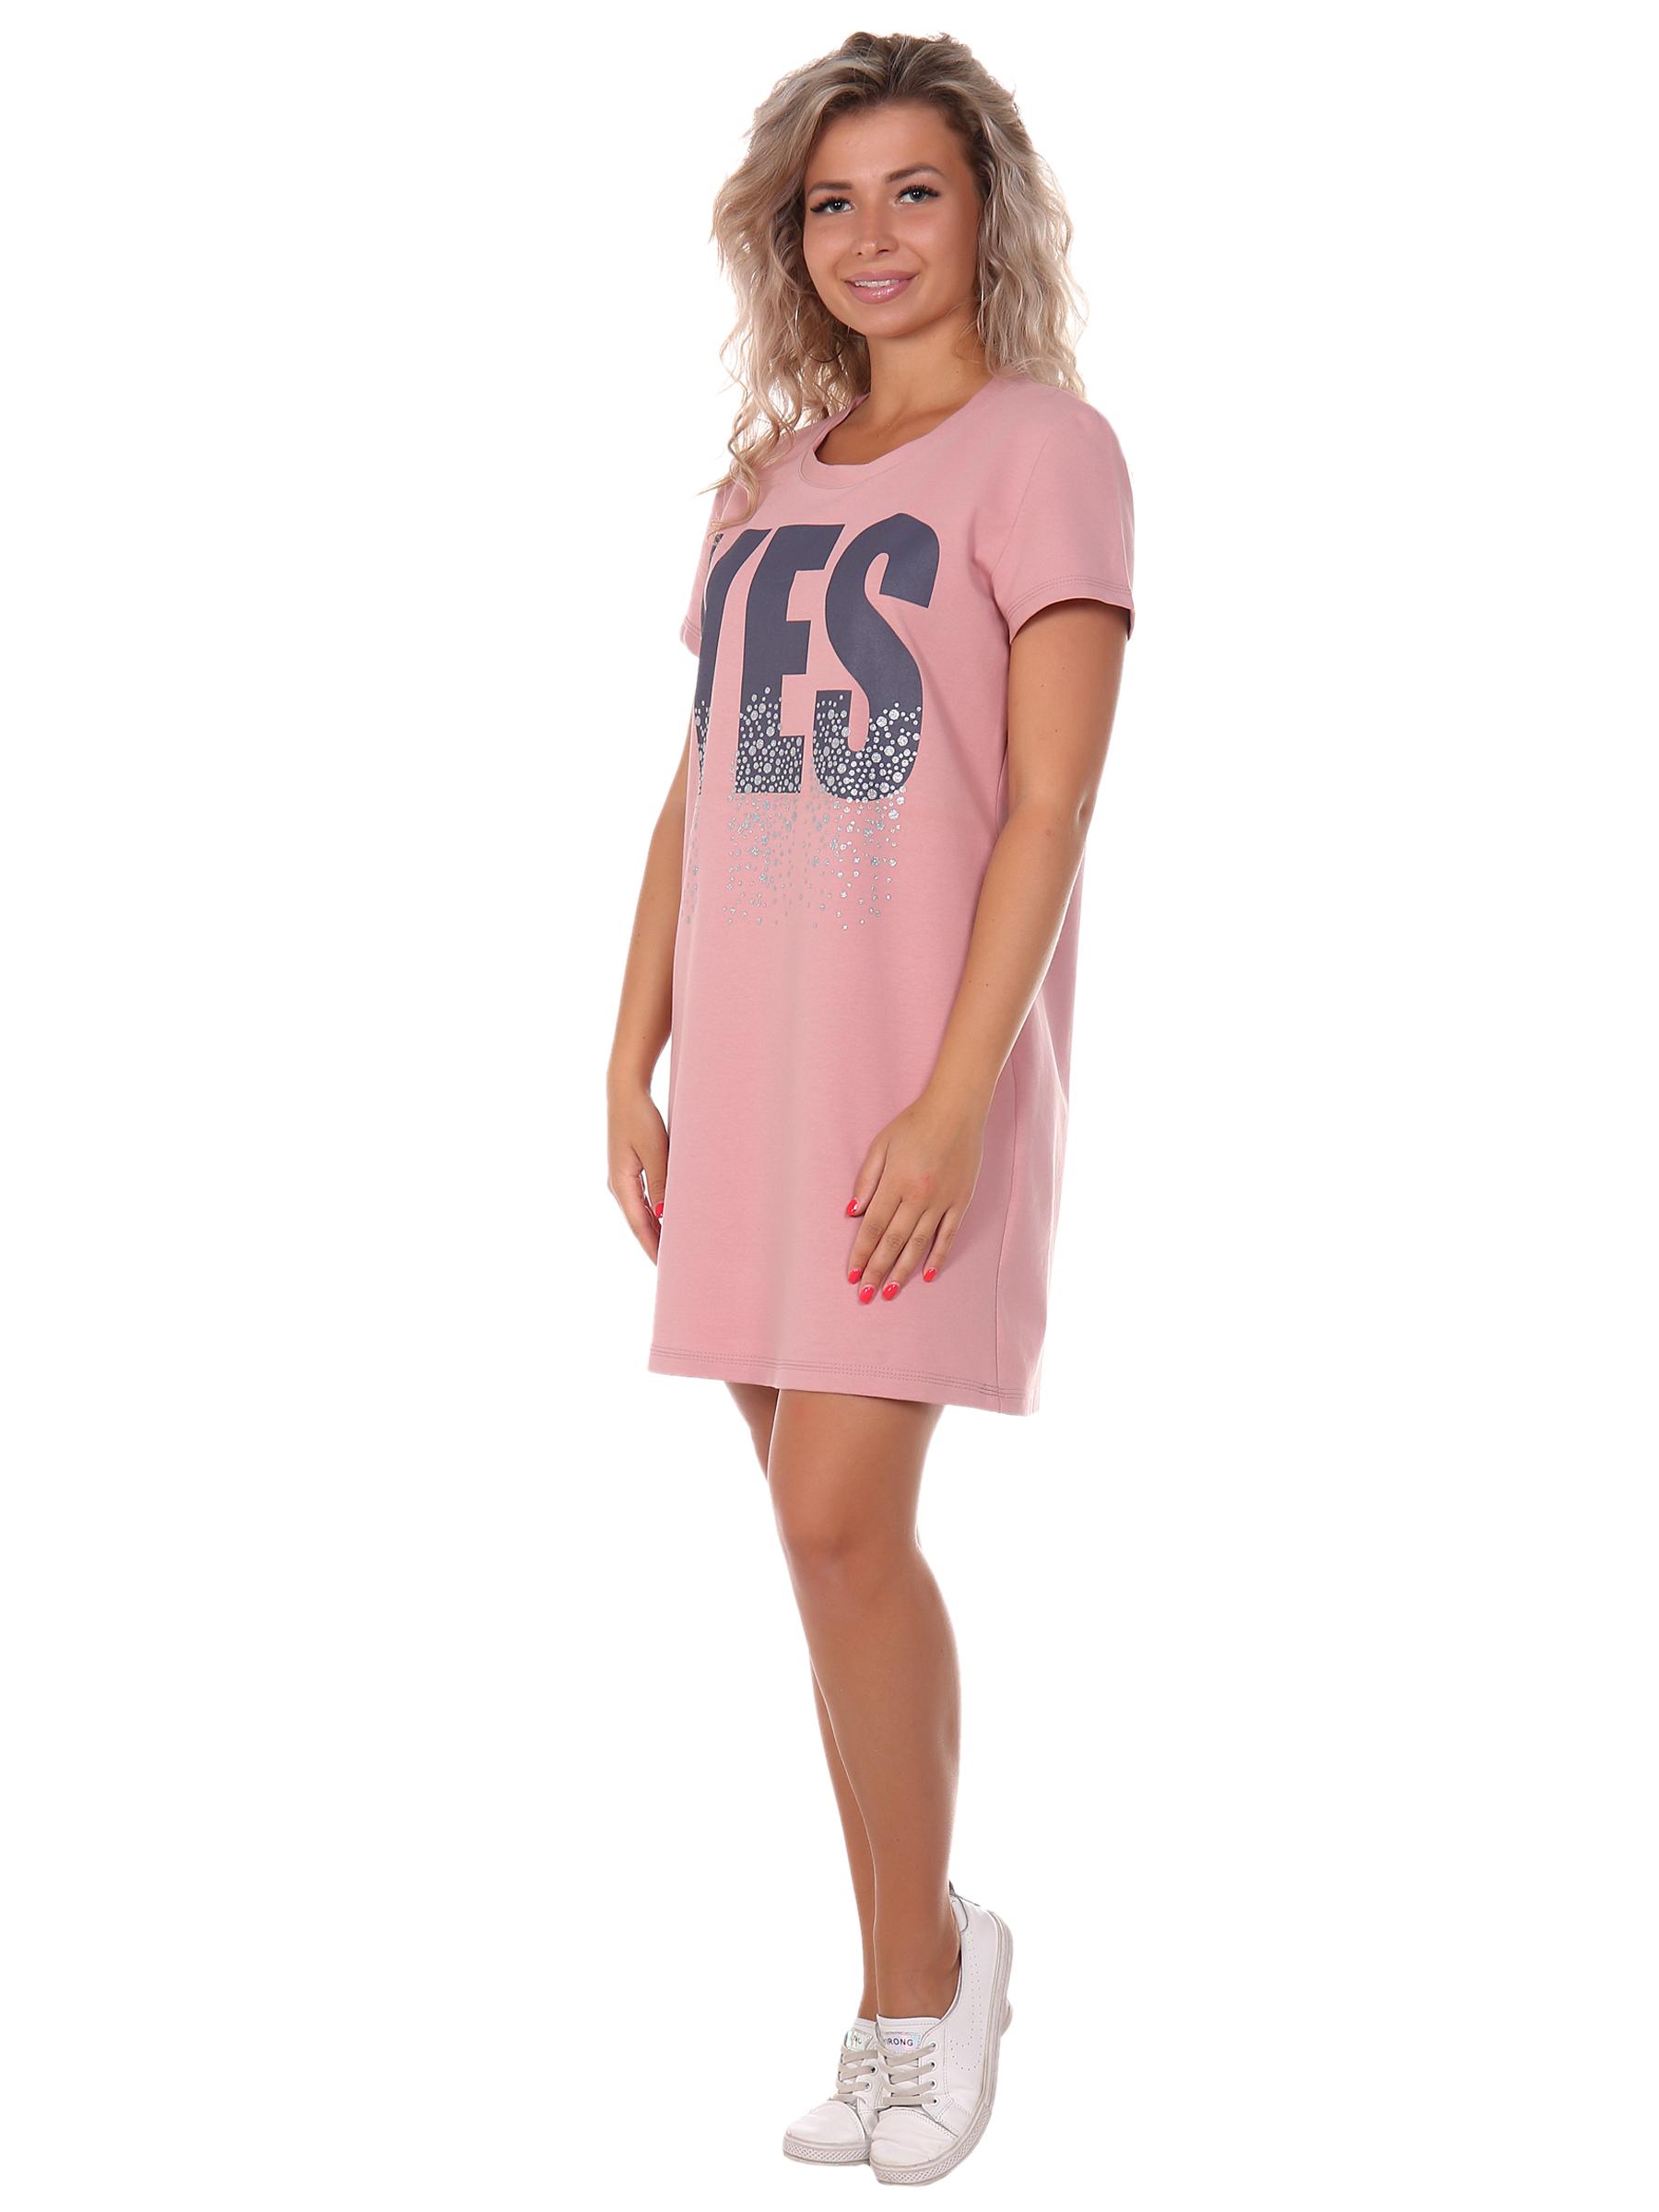 П-021 НСД Платье женское (футер) П-021 НСД